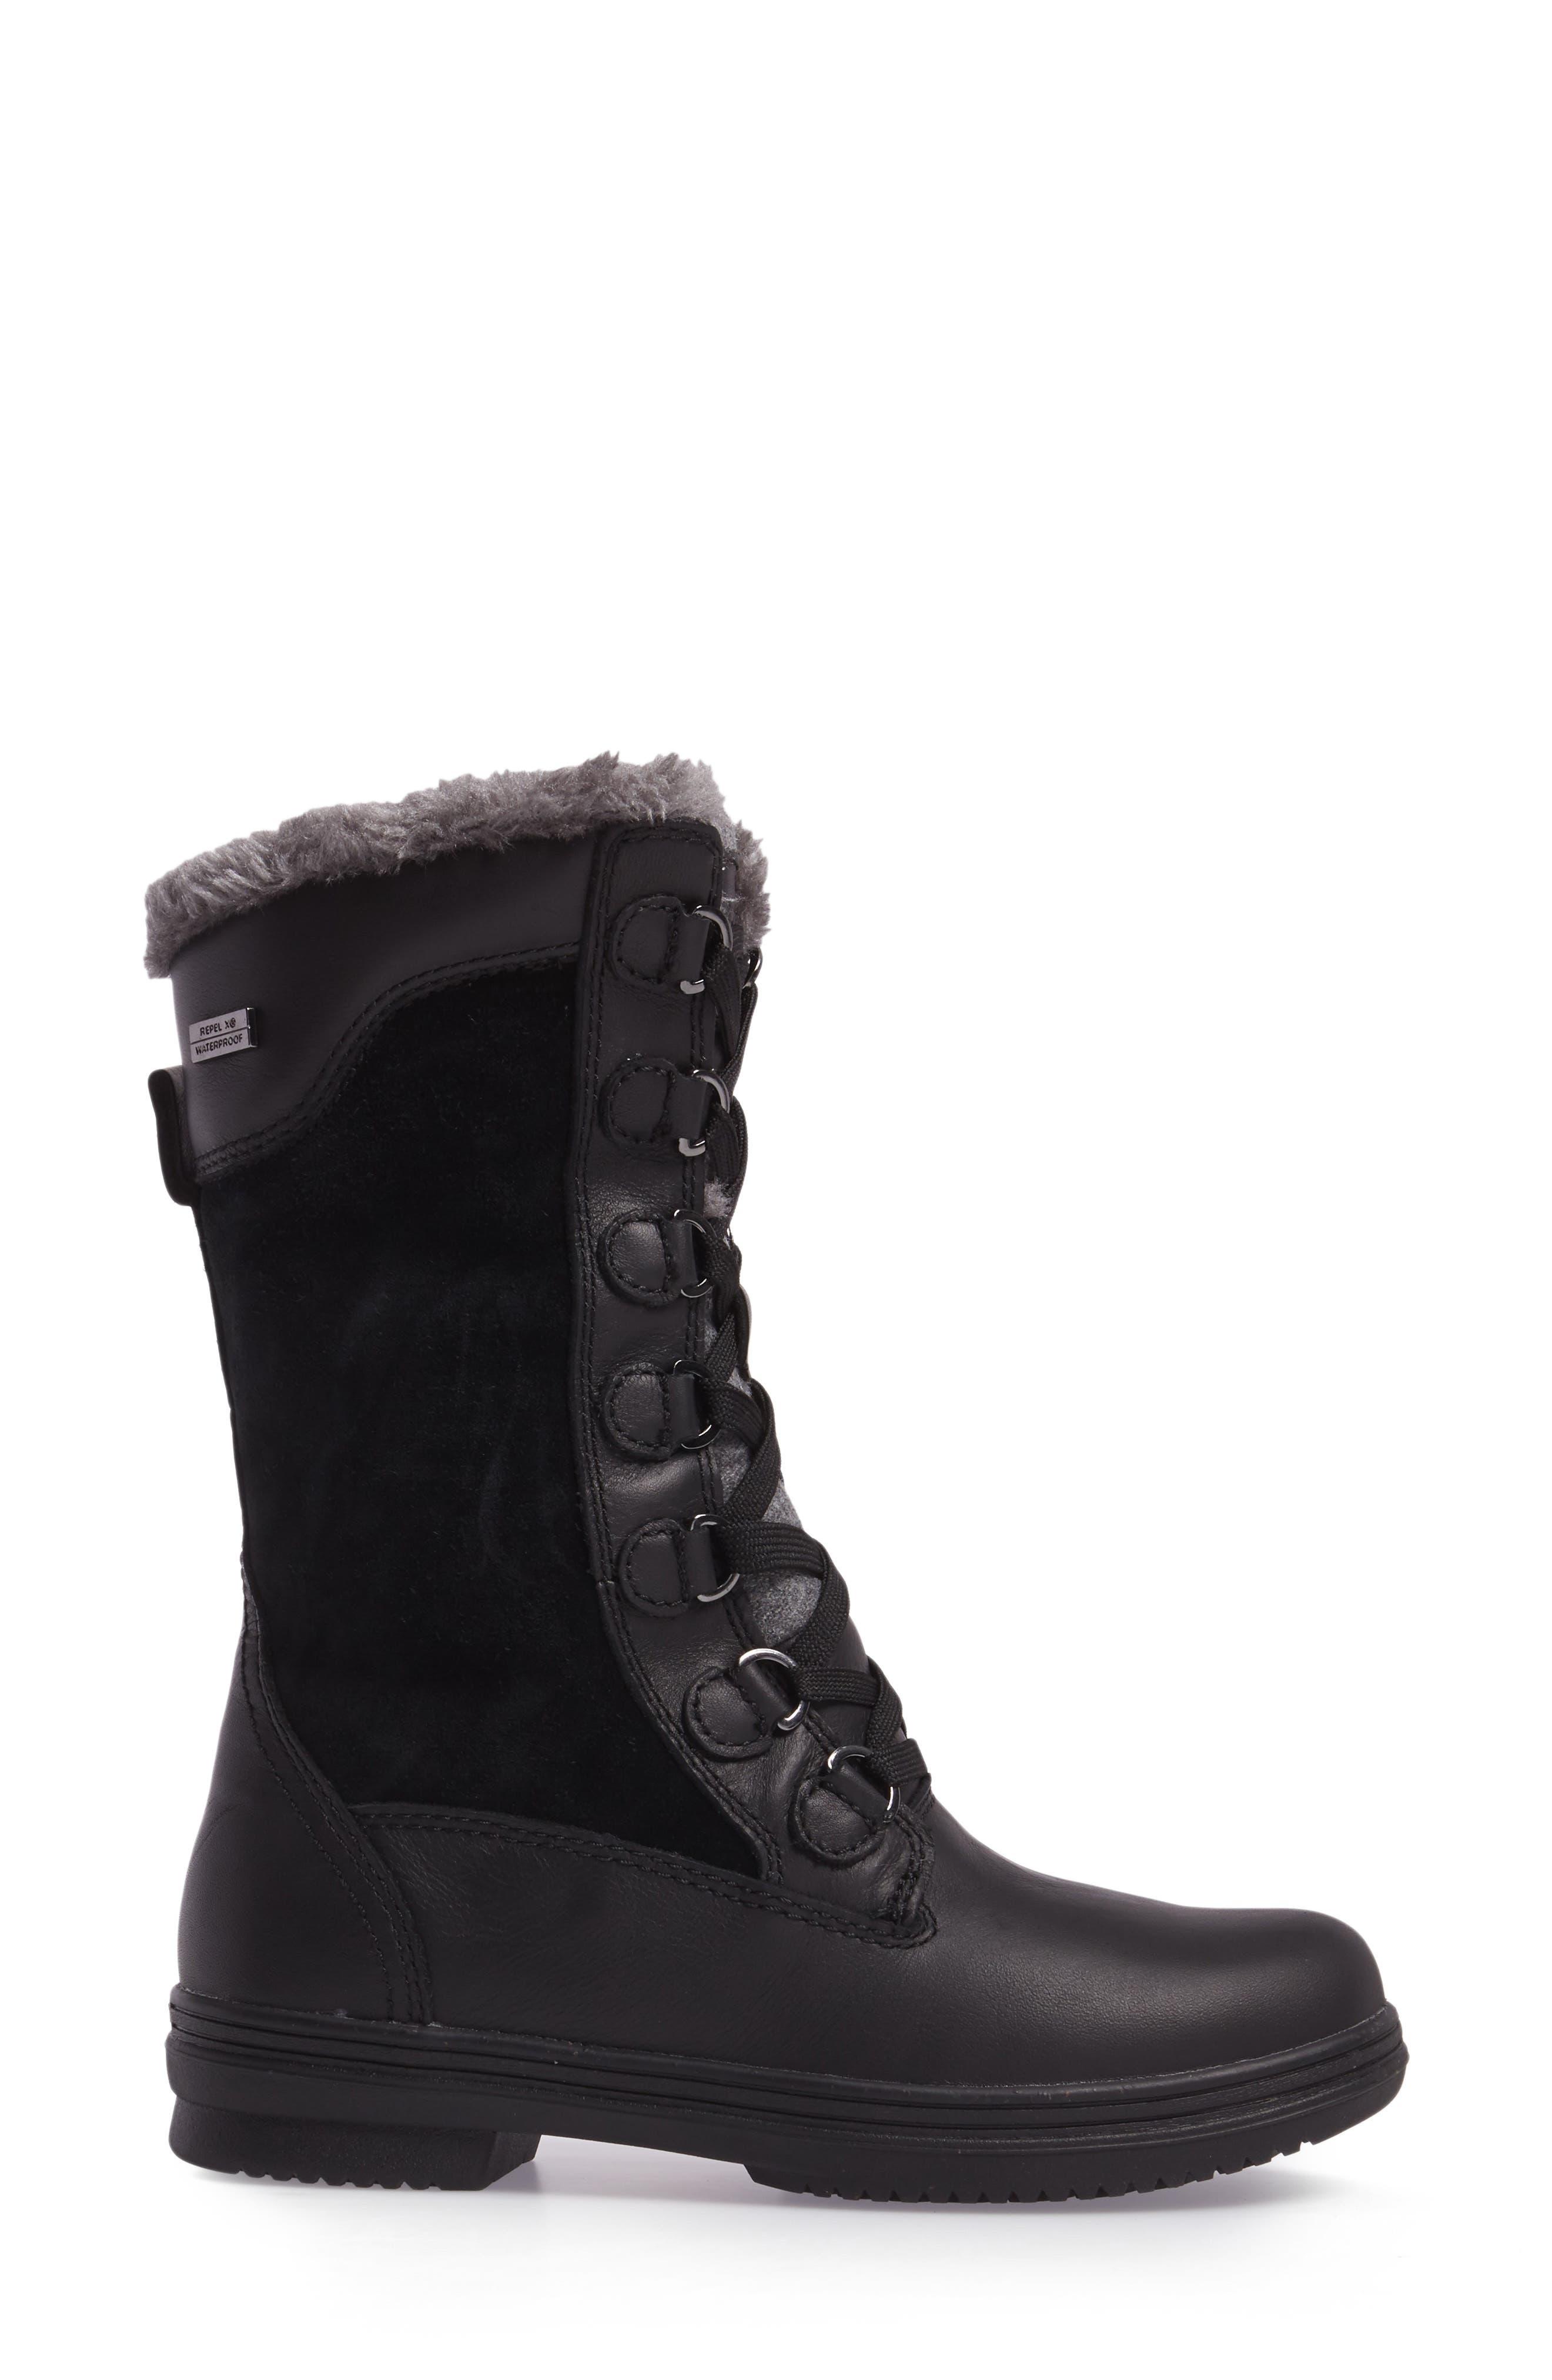 Glata Waterproof Boot,                             Alternate thumbnail 3, color,                             Black Leather